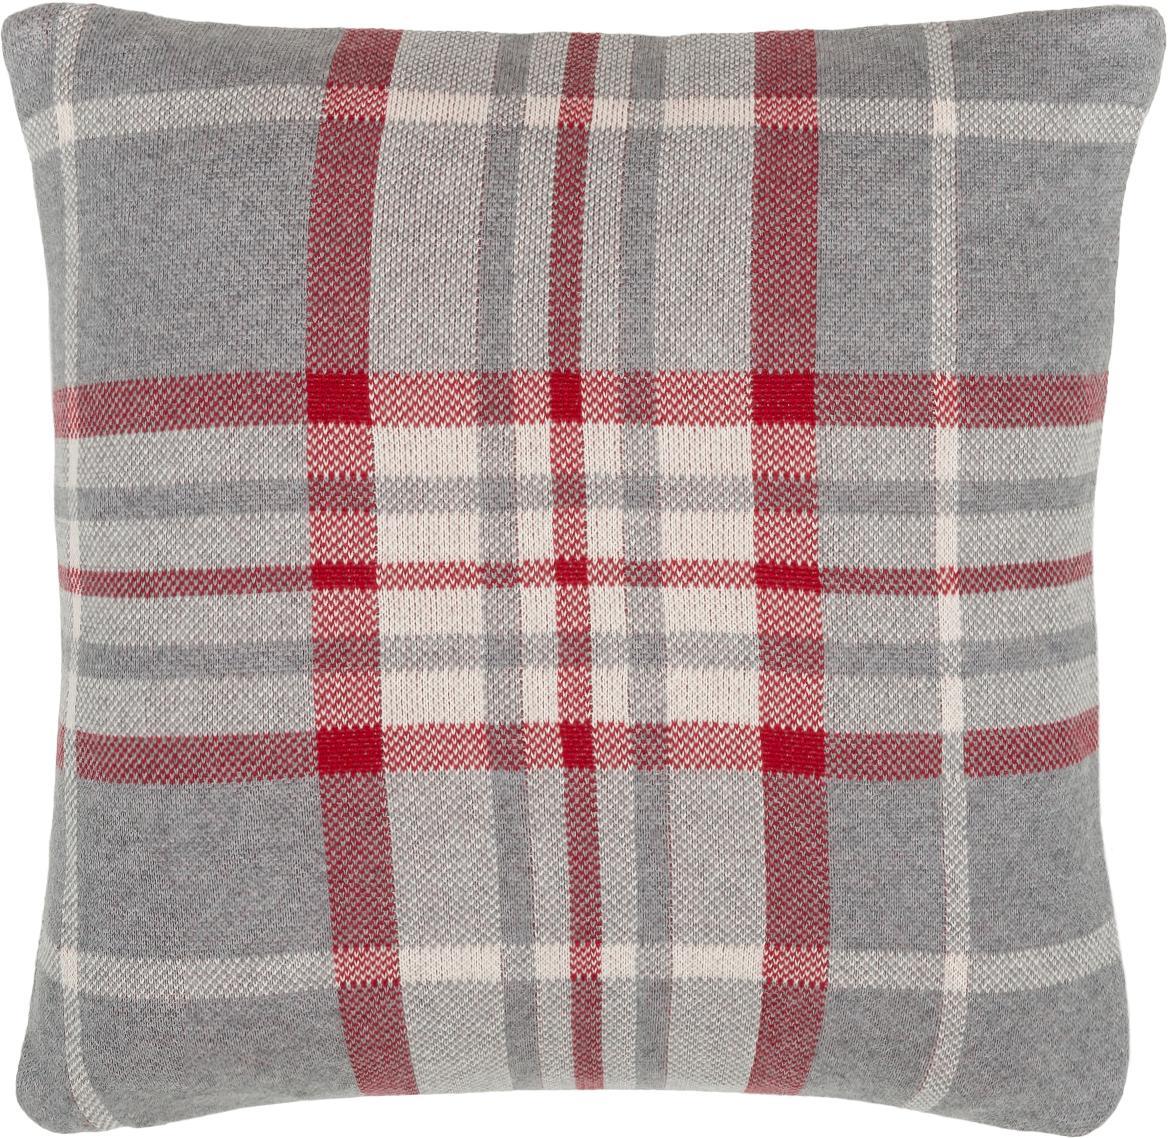 Karierte Strick-Kissenhülle Louis, Baumwolle, Grau, Weiß, Rot, 40 x 40 cm